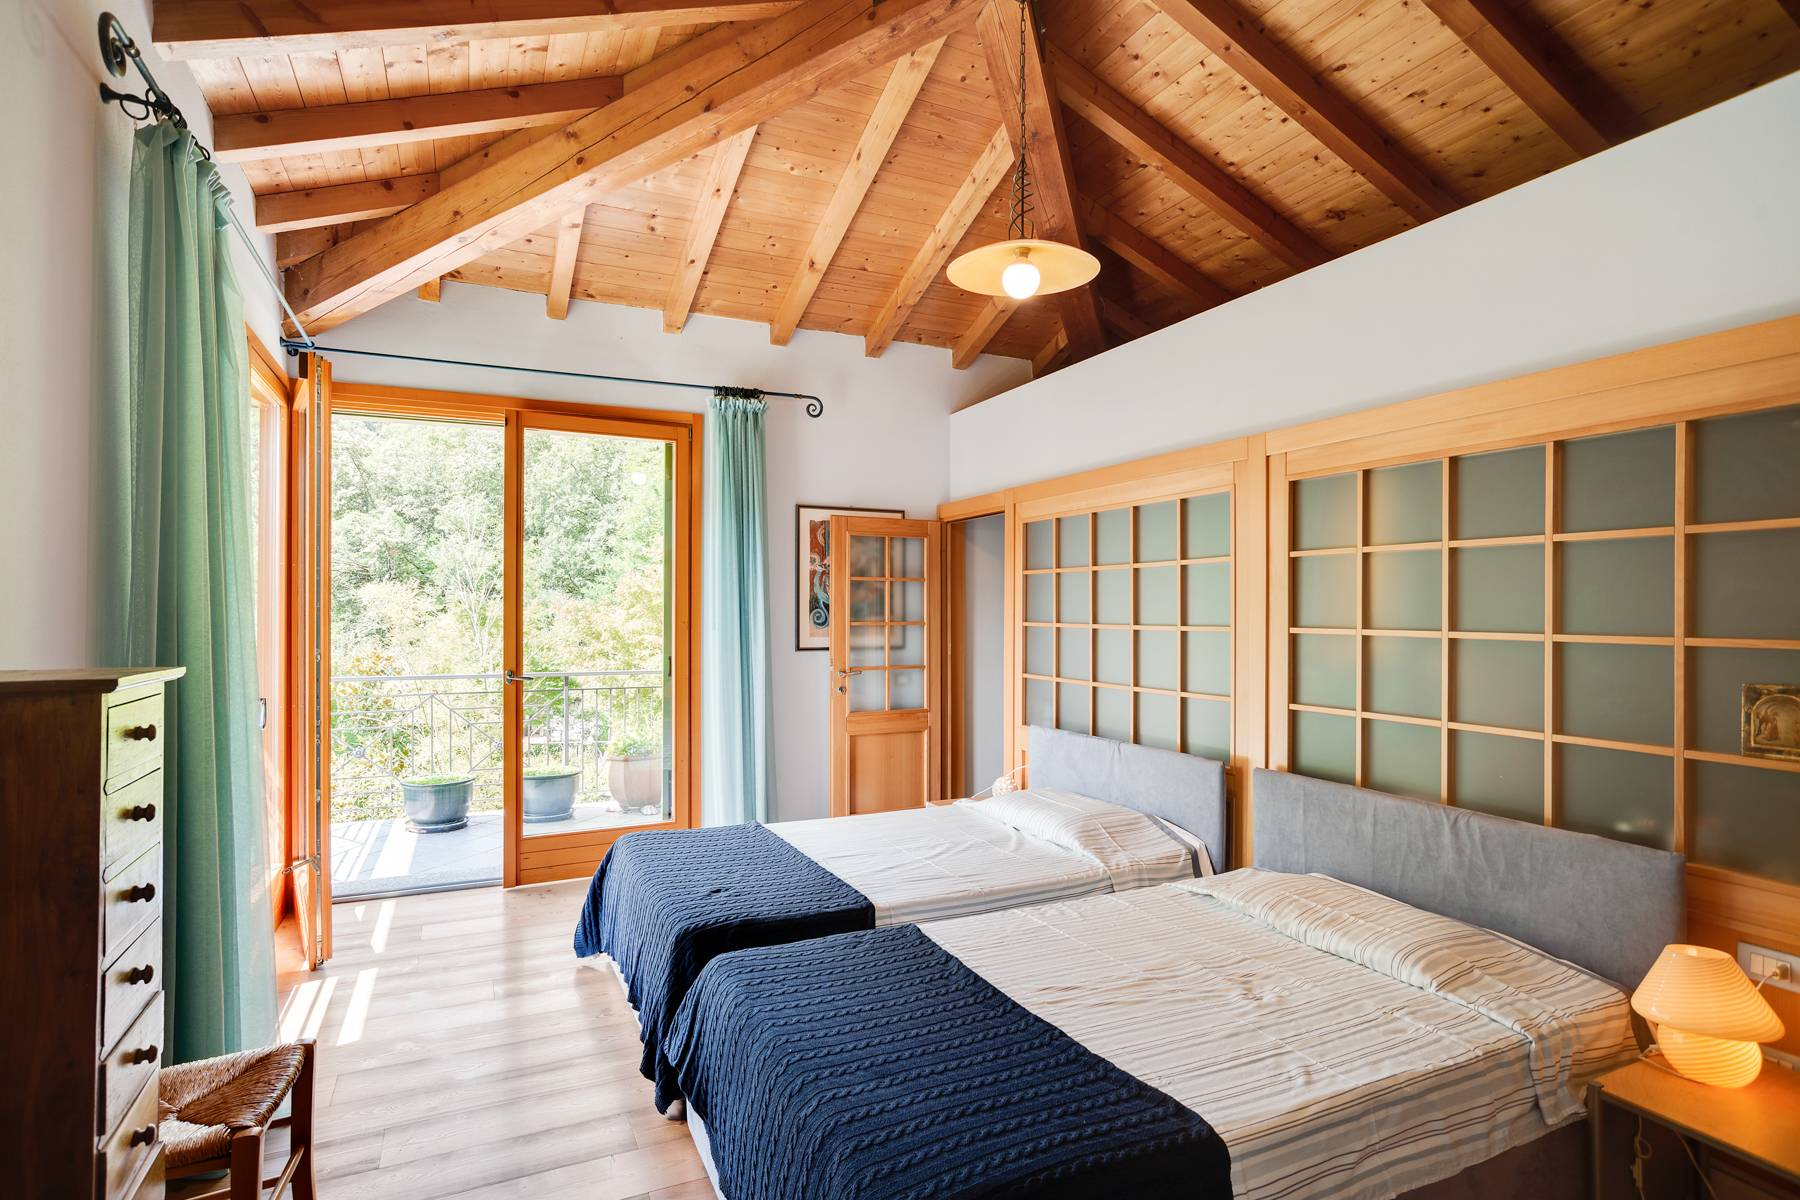 Splendida villa moderna sulla collina soleggiata sopra Argegno - 24